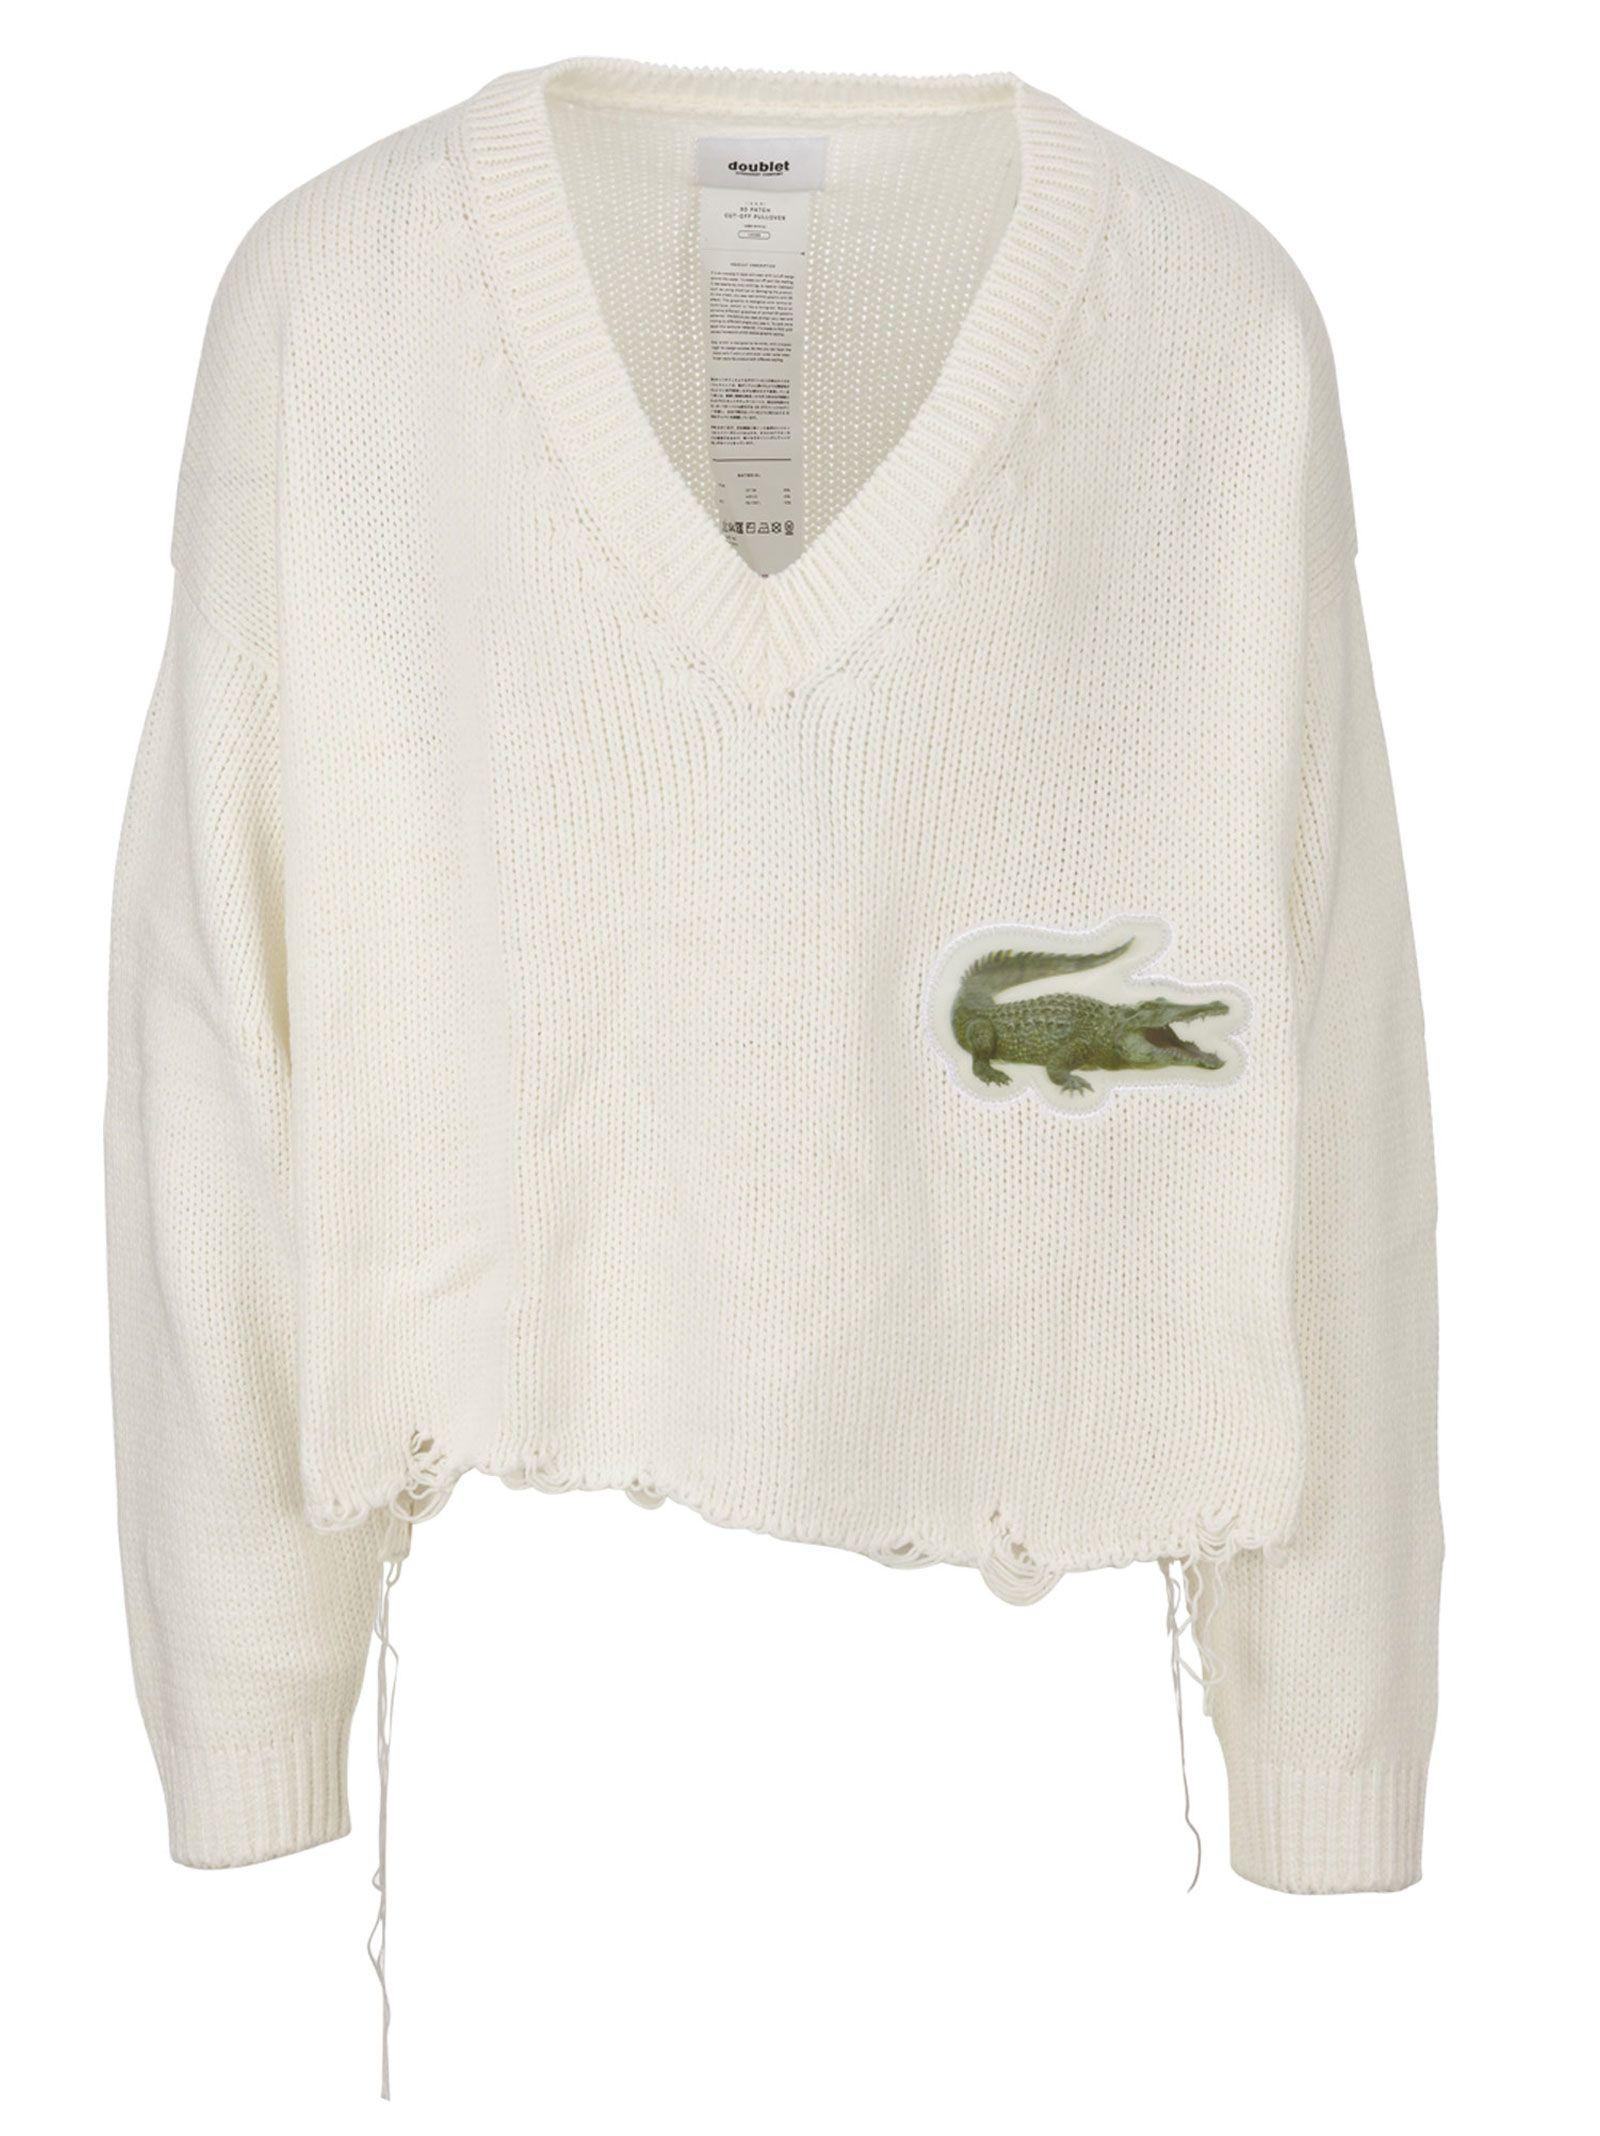 Doublet Sweater